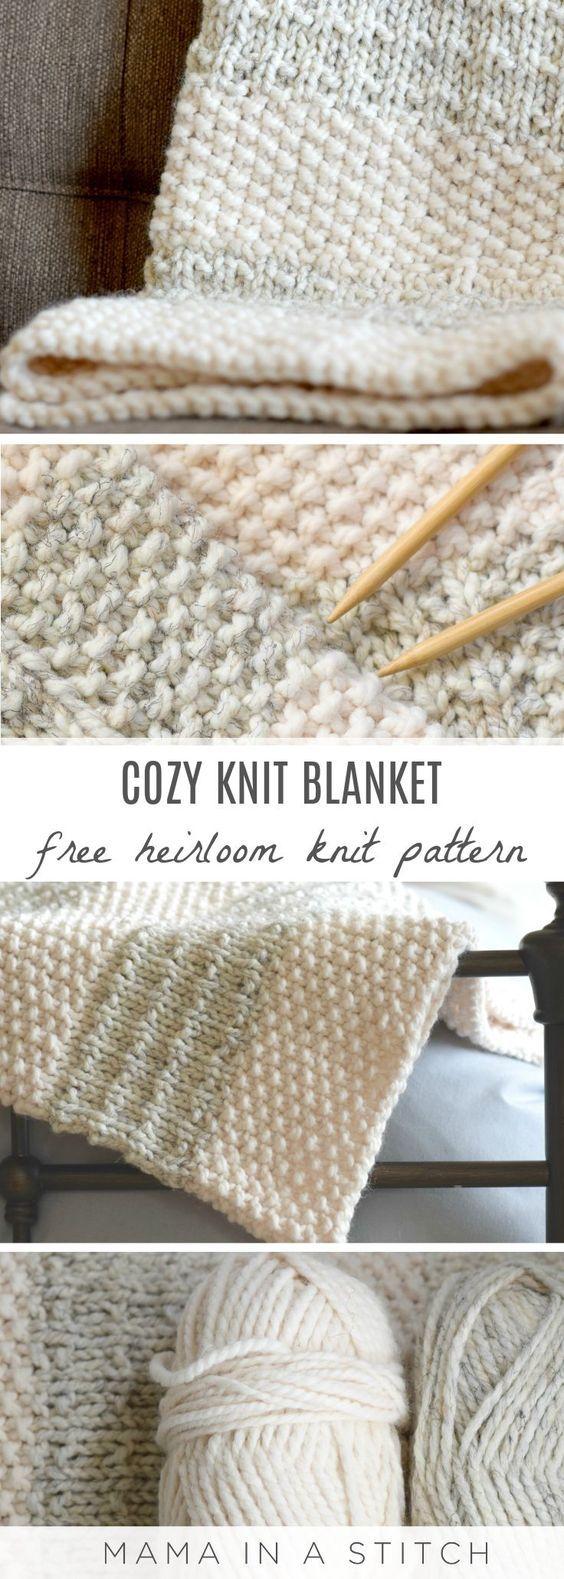 Easy Heirloom Knit Blanket Pattern